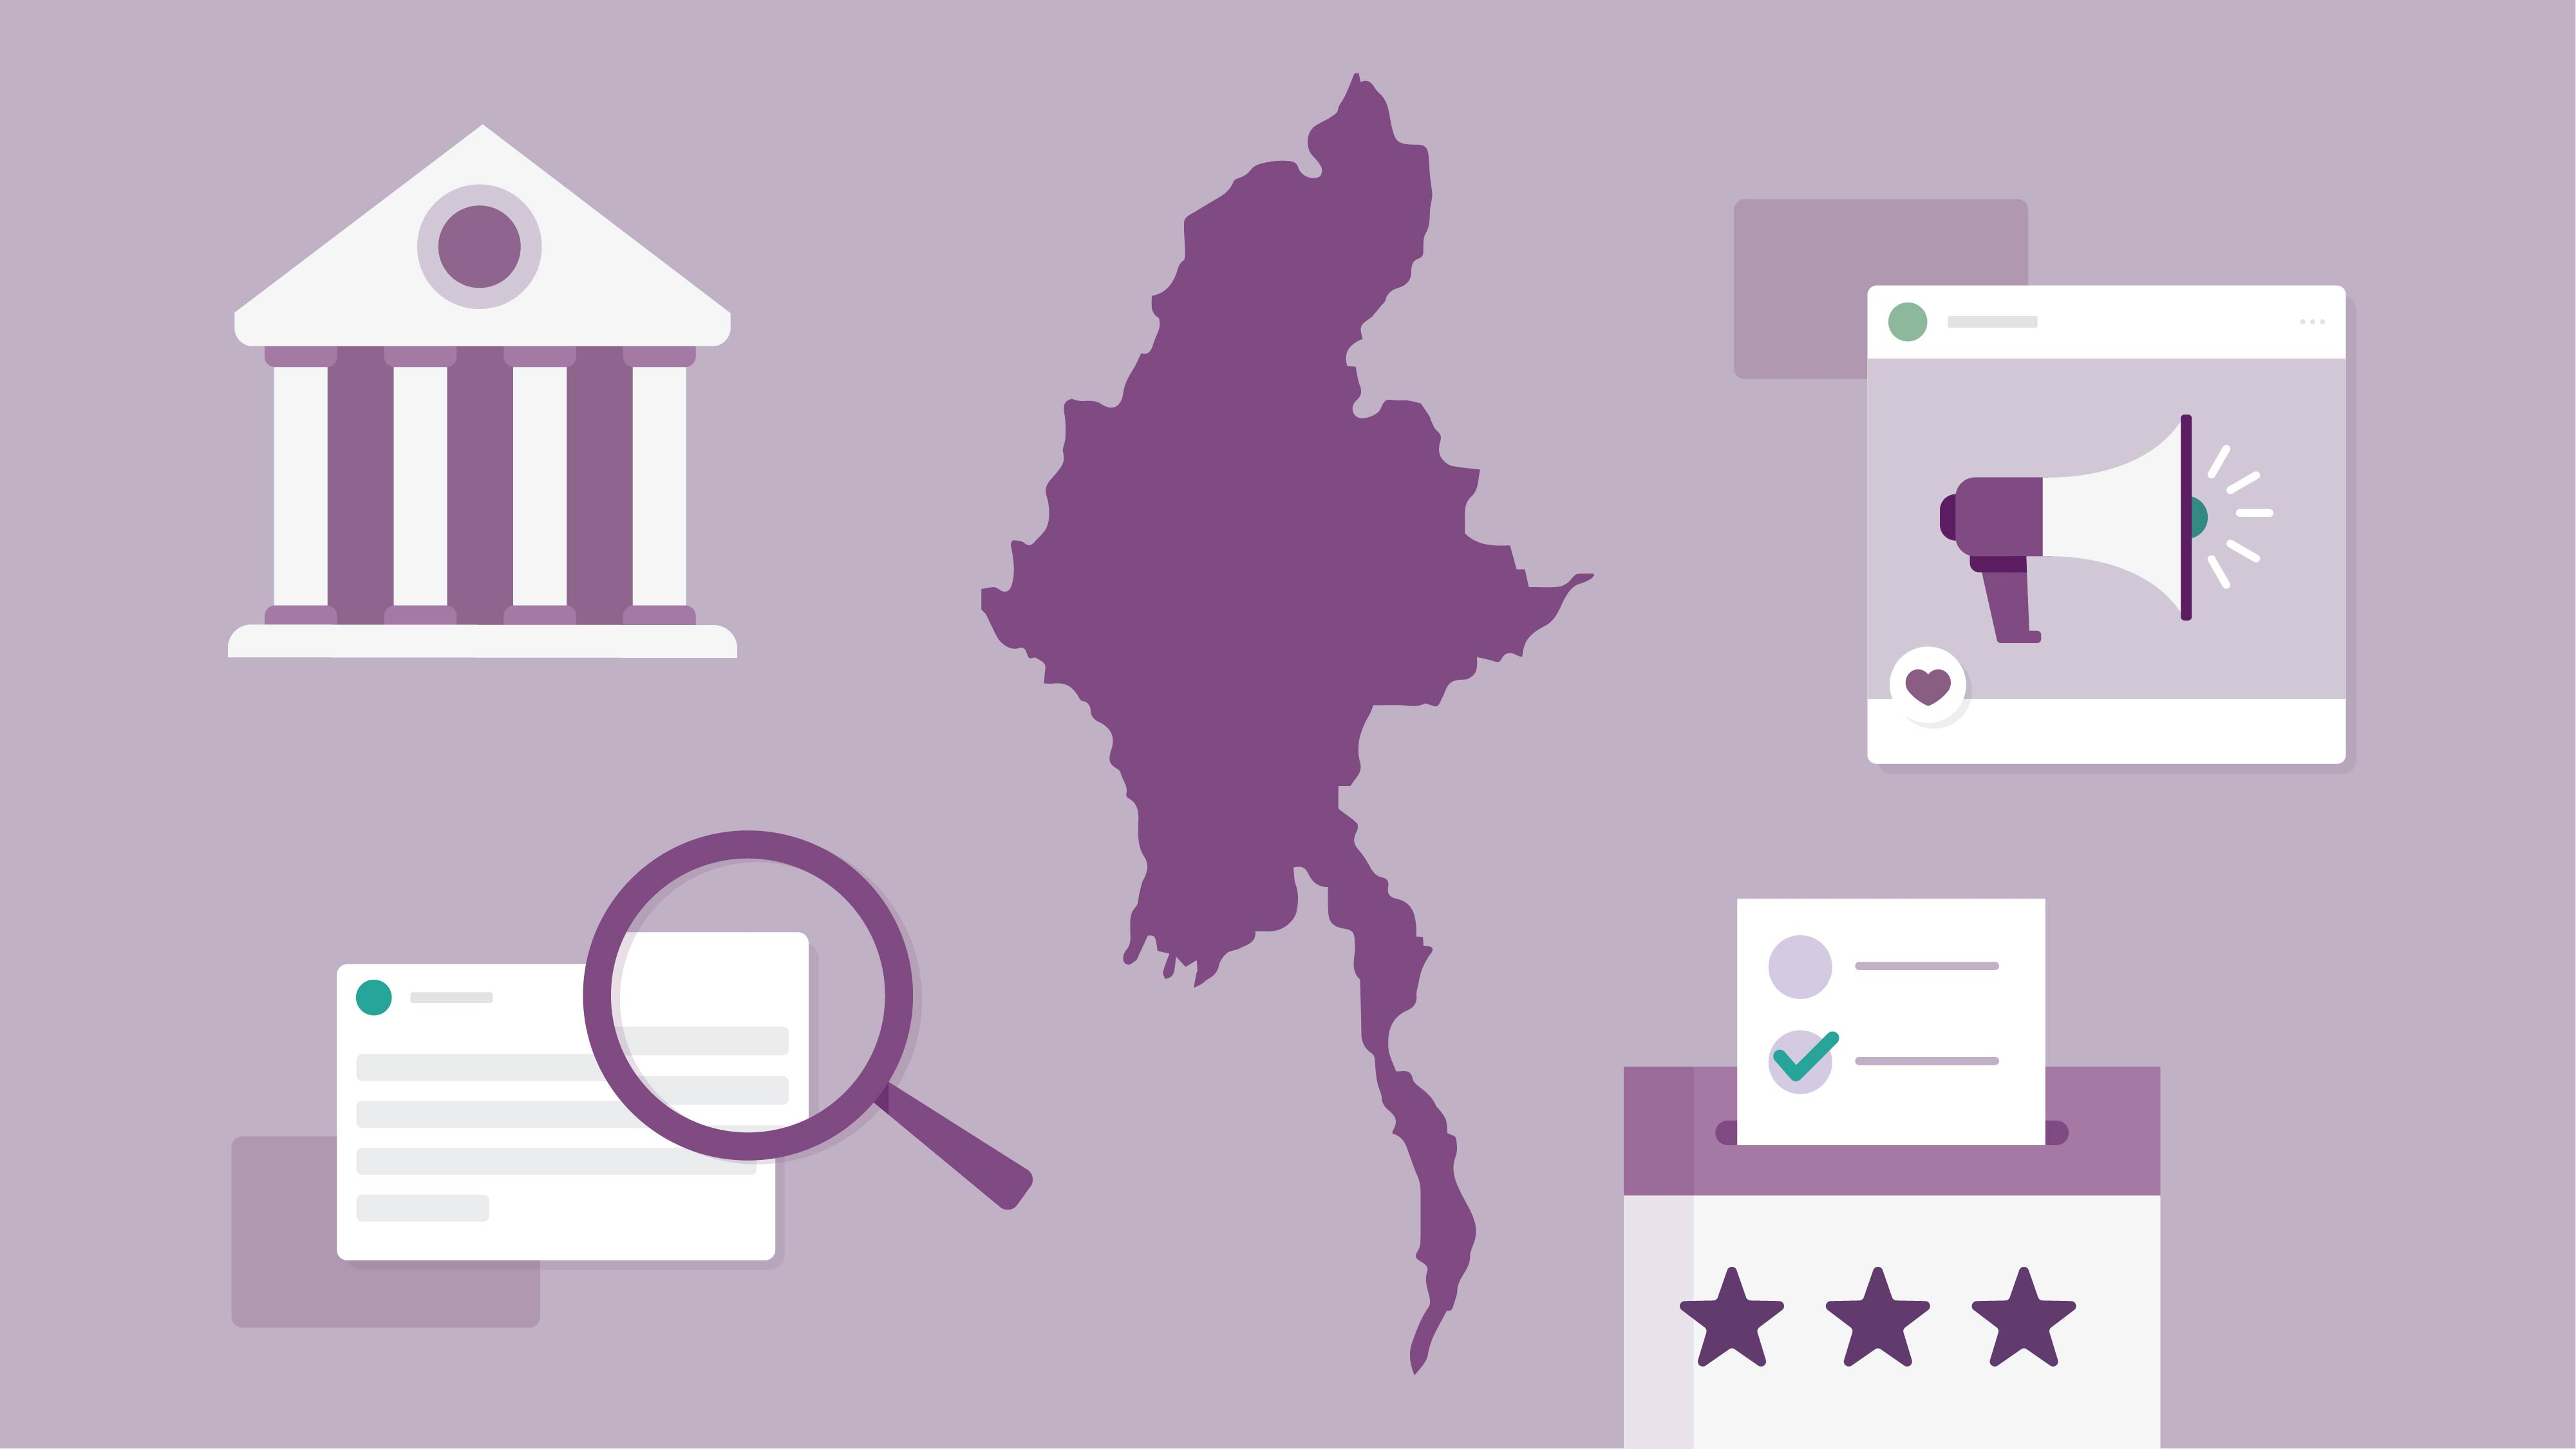 How Facebook Is Preparing for Myanmar's 2020 Election